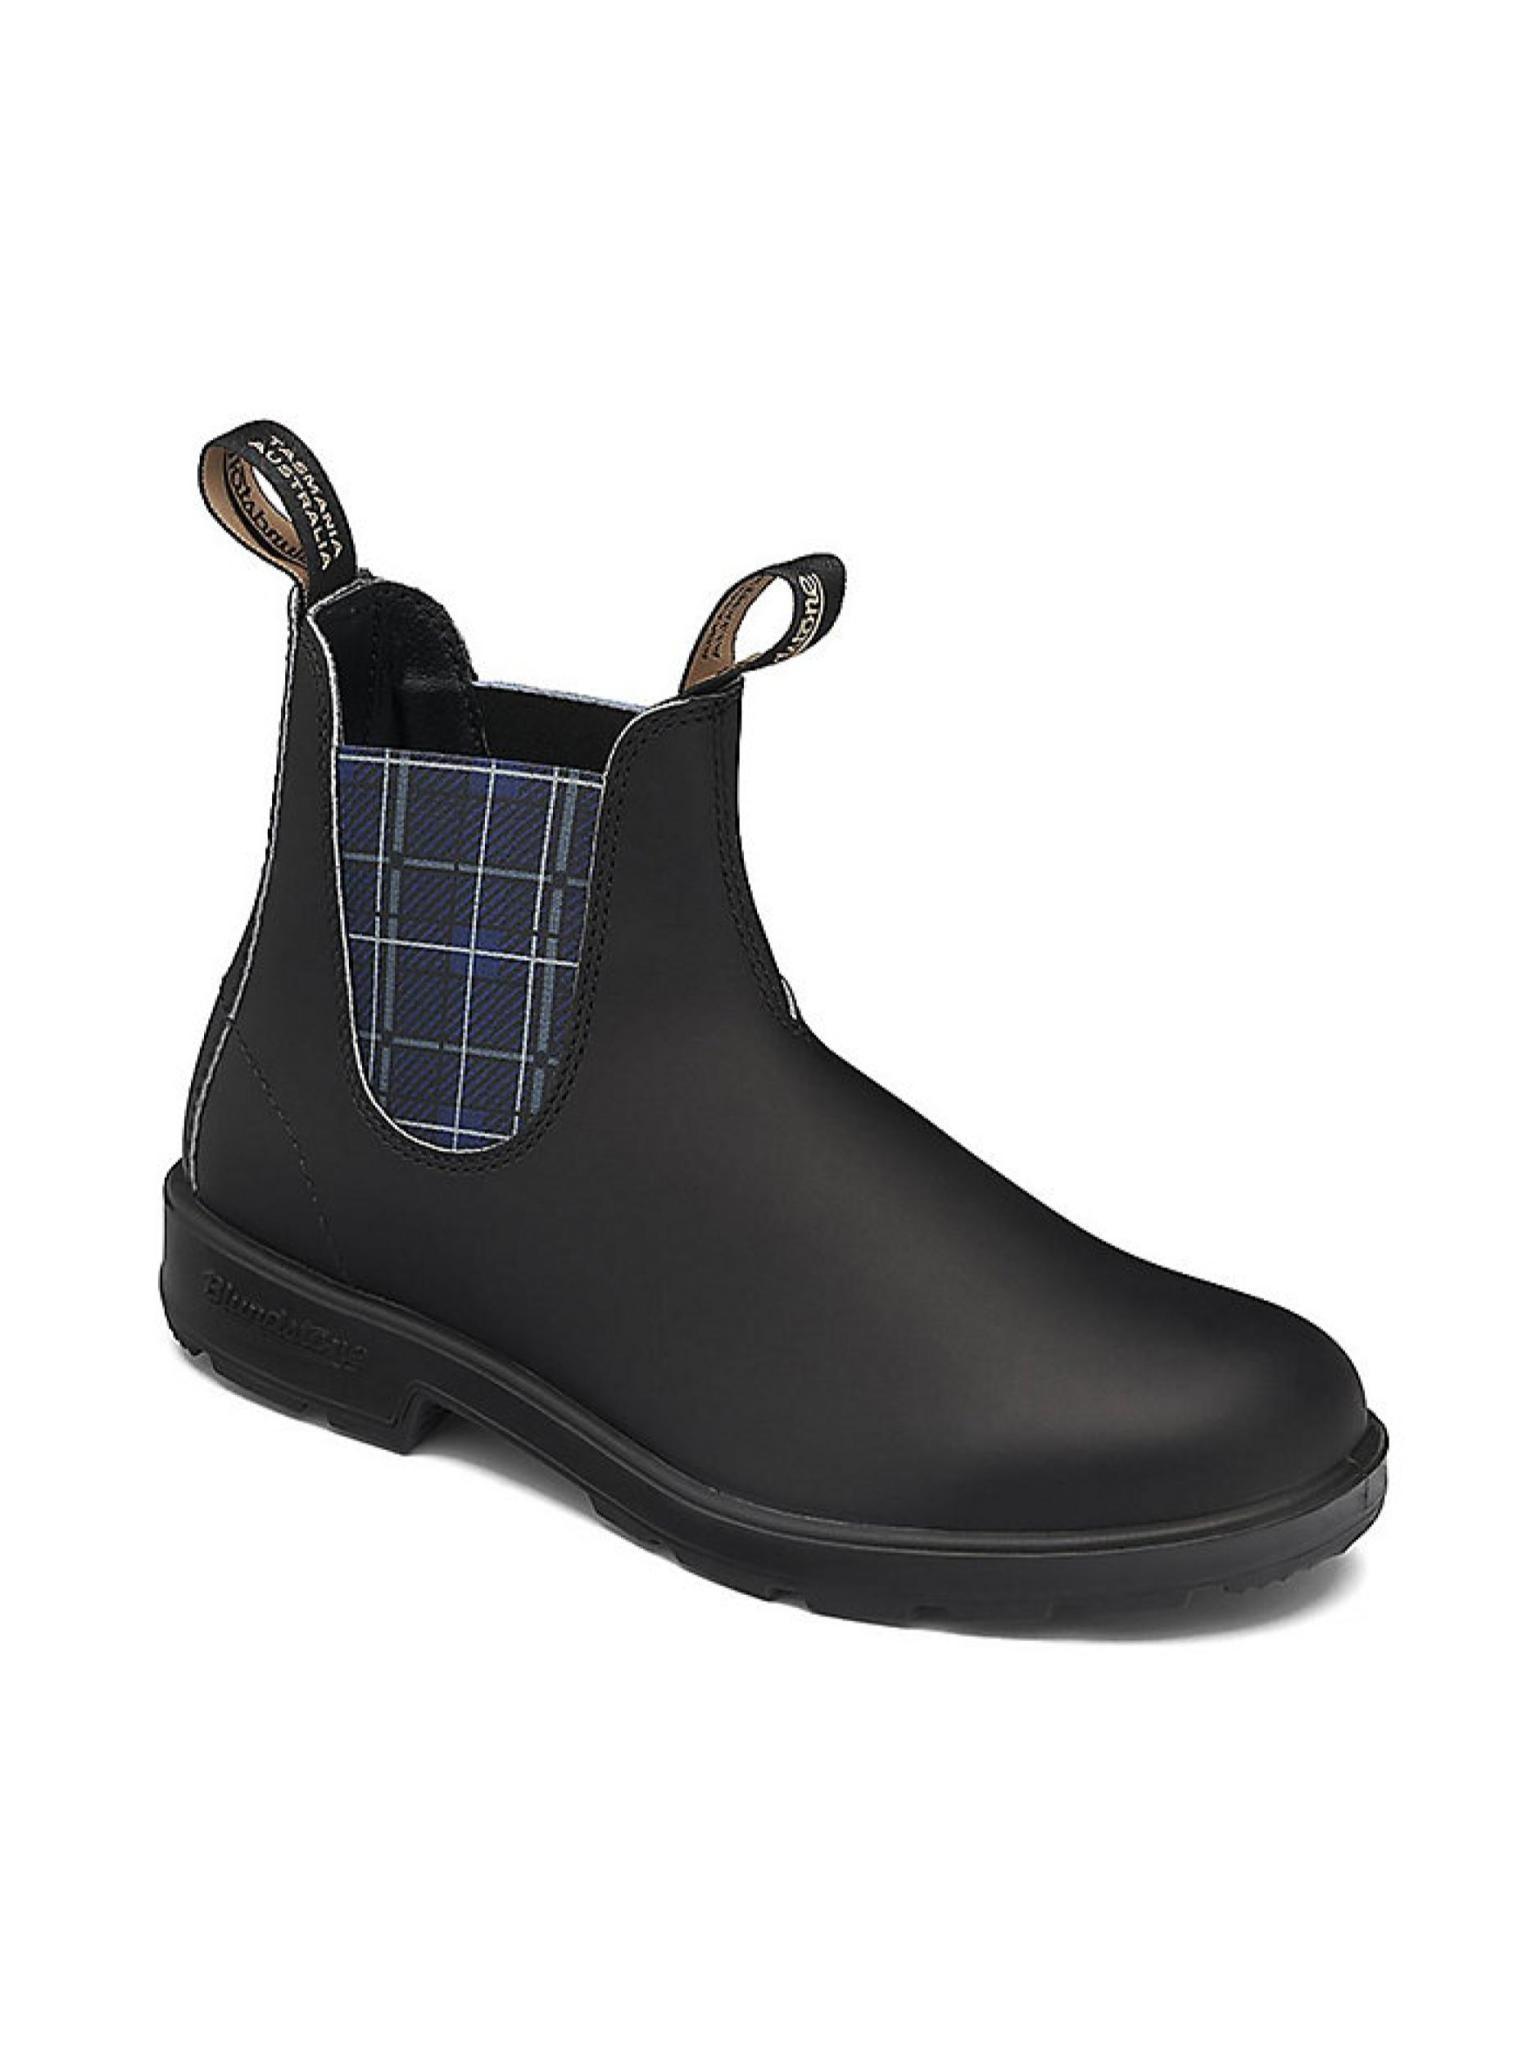 Blundstone Women's Original 2102 Chelsea Boot